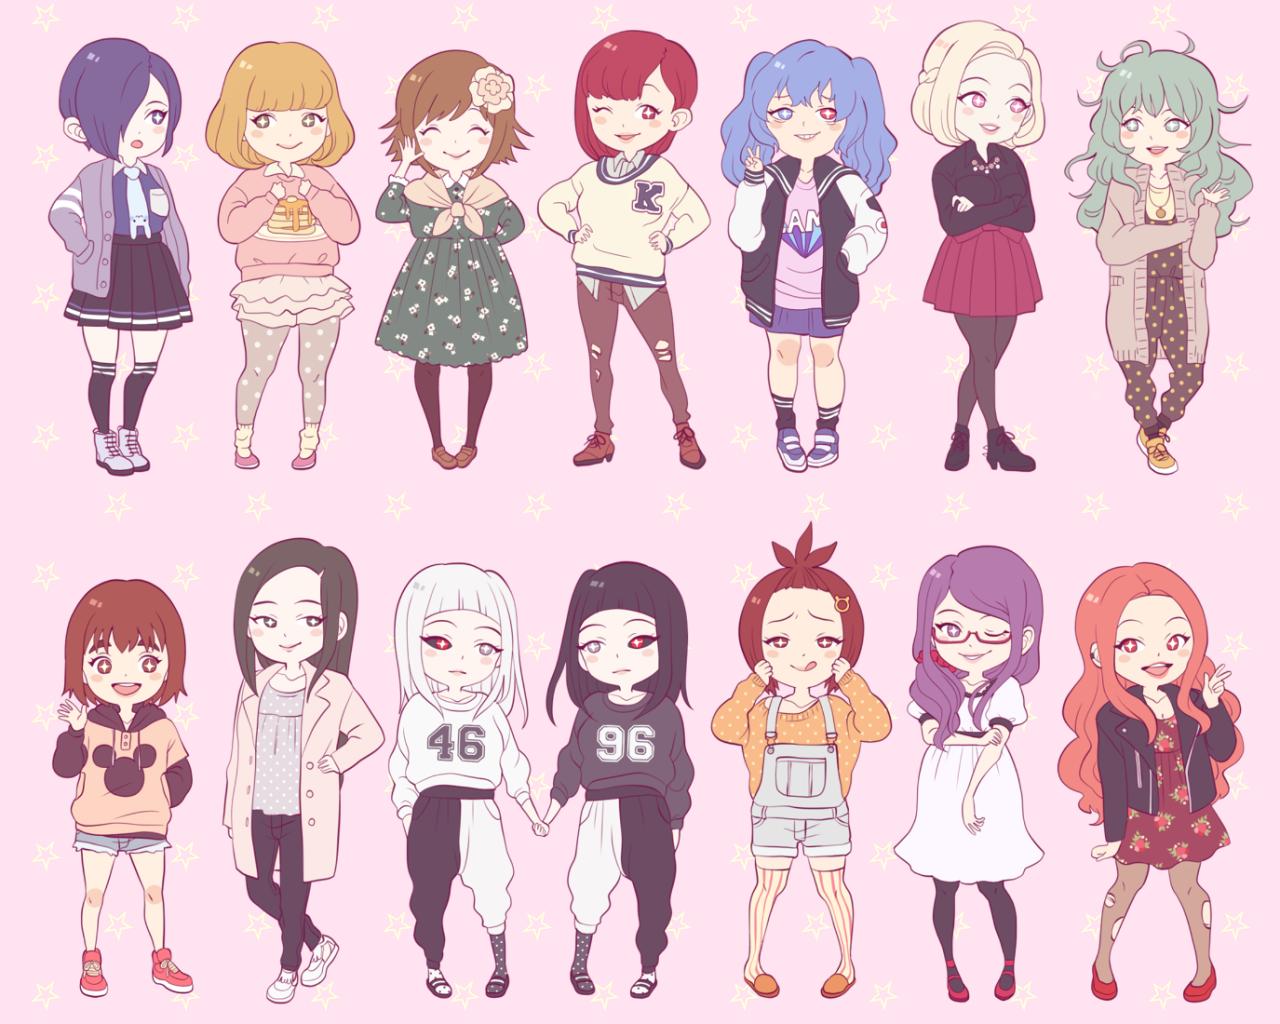 girls girls girls!!♥(✿ฺ´∀`✿ฺ)ノ